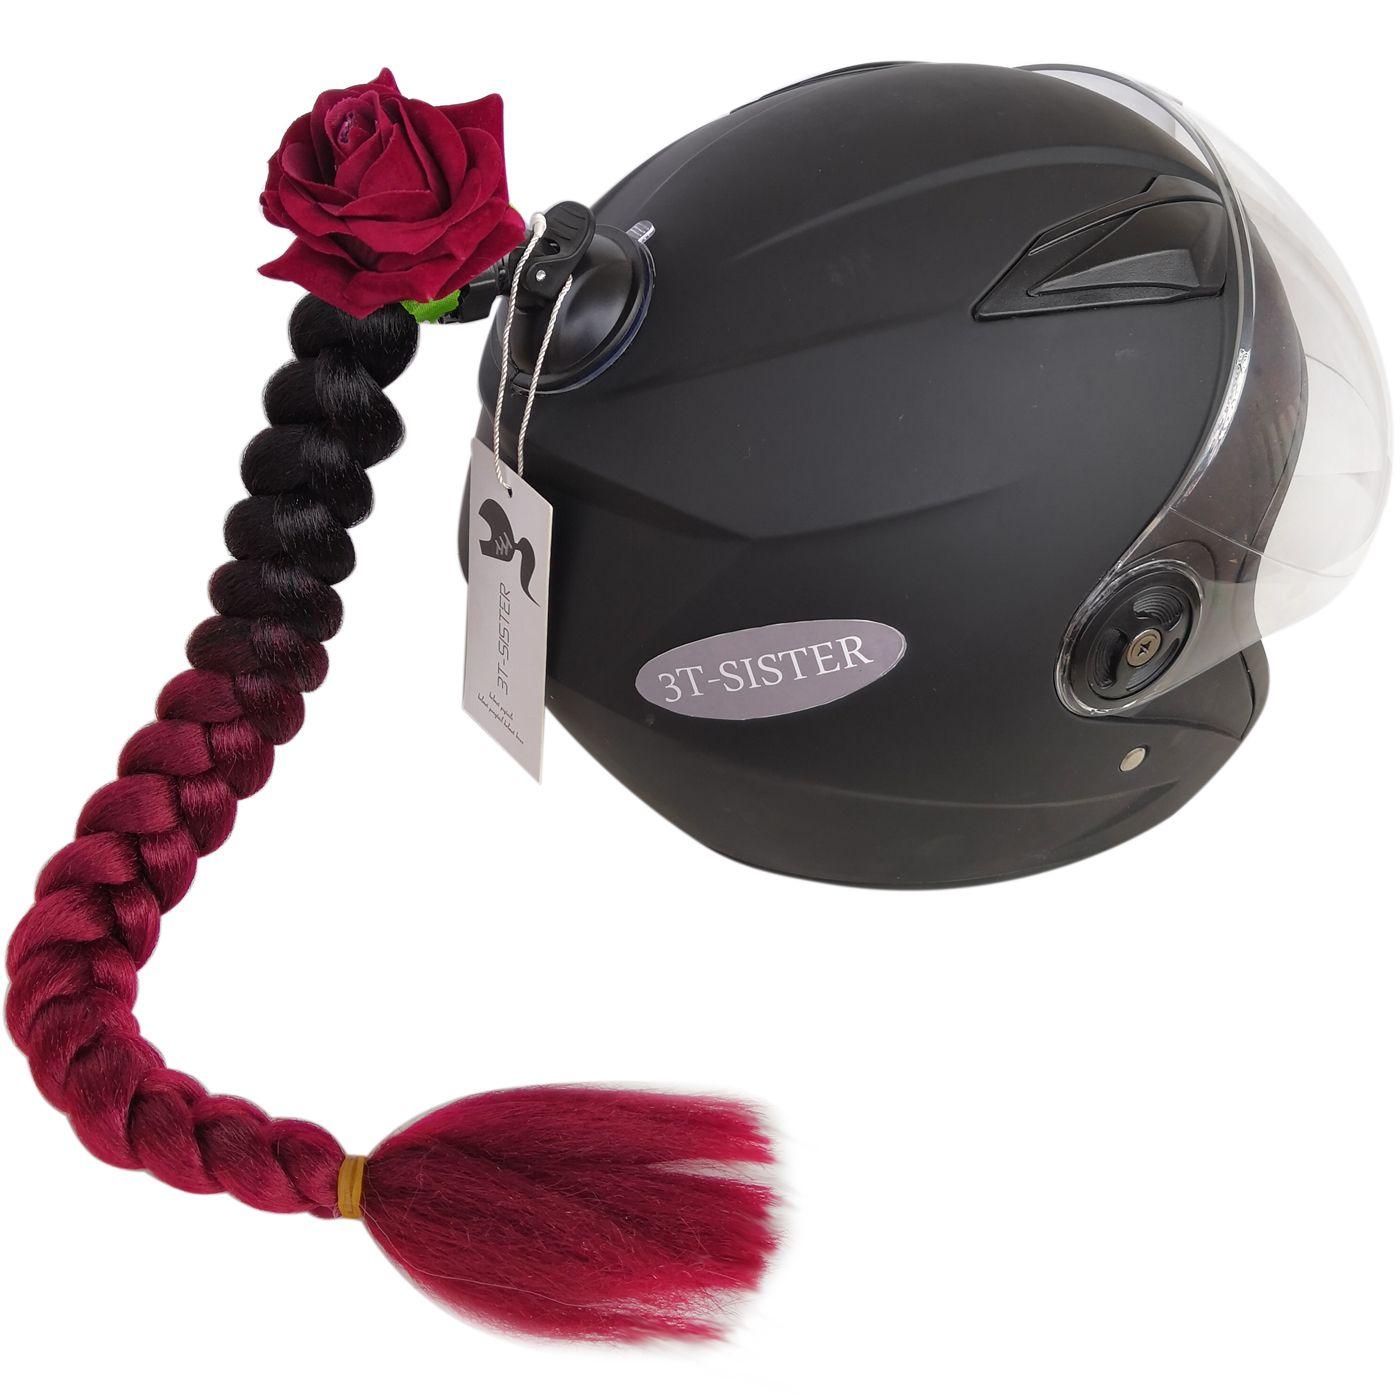 3T-SISTER Helmet Pigtails Gradient Ramp Helmet Braids Ponytail Helmet Hair with Suction Cup for Motor Bike 1PCS 24inch